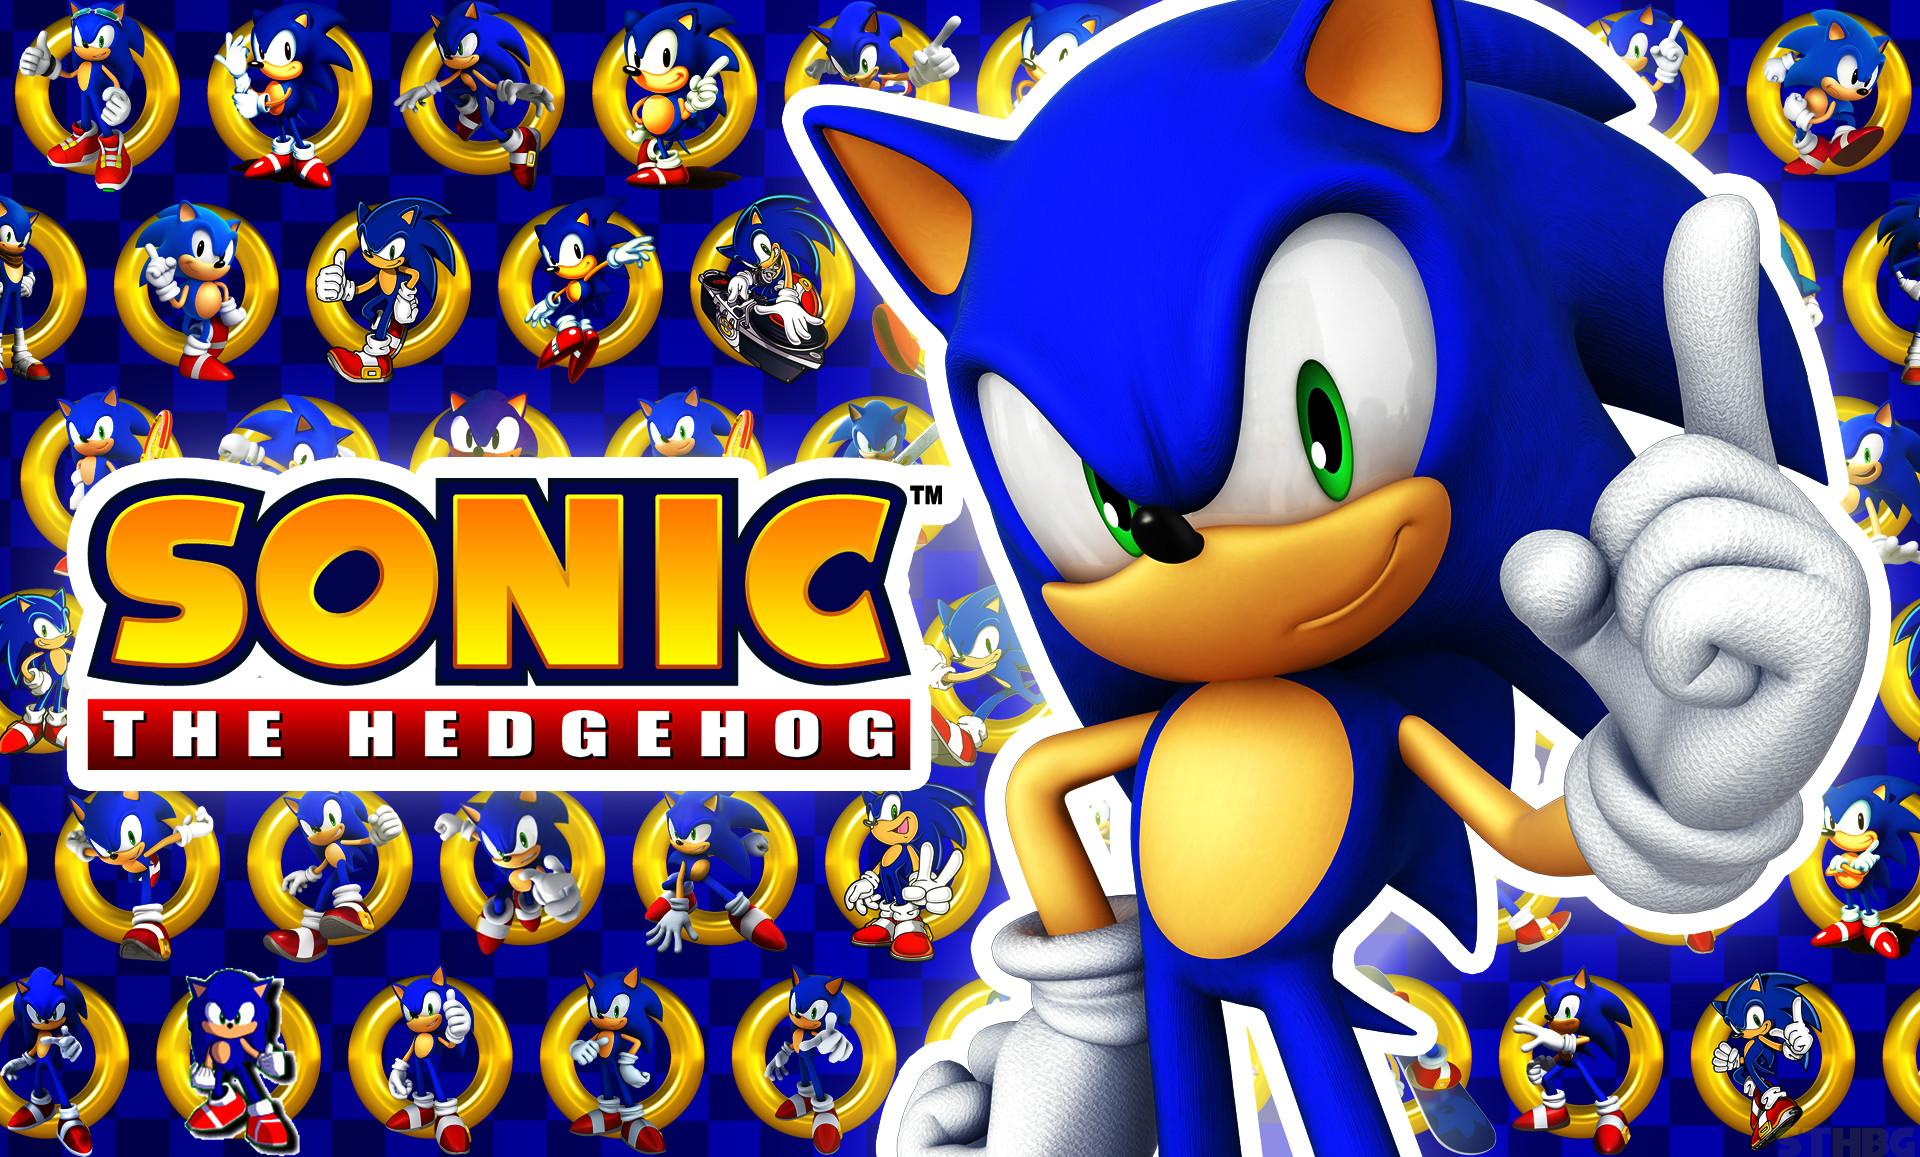 Sonic The Hedgehog Wallpaper by SonicTheHedgehogBG on DeviantArt 1920×1157